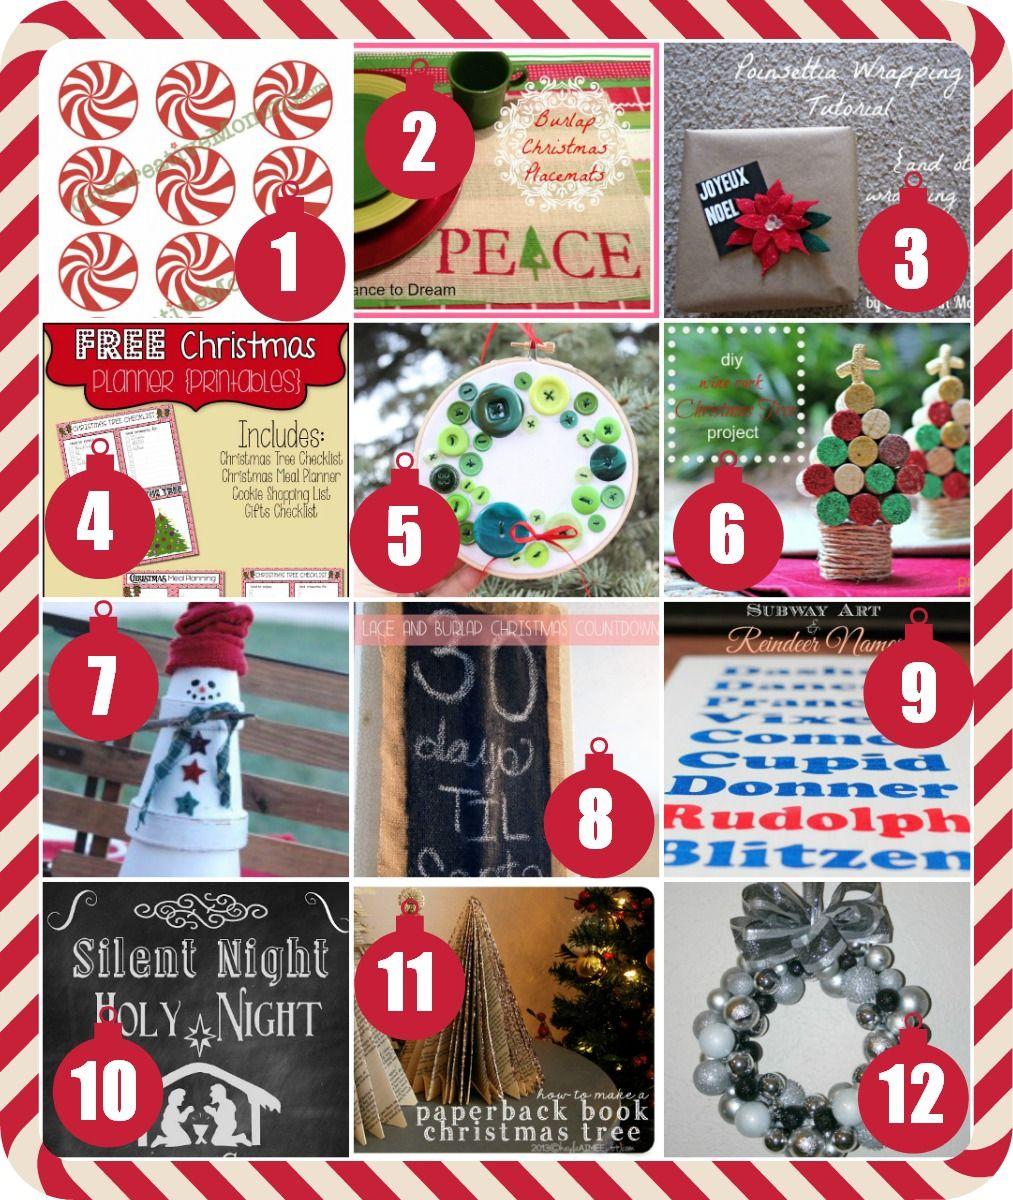 Representation of Creative Christmas Crafts To Make At Home